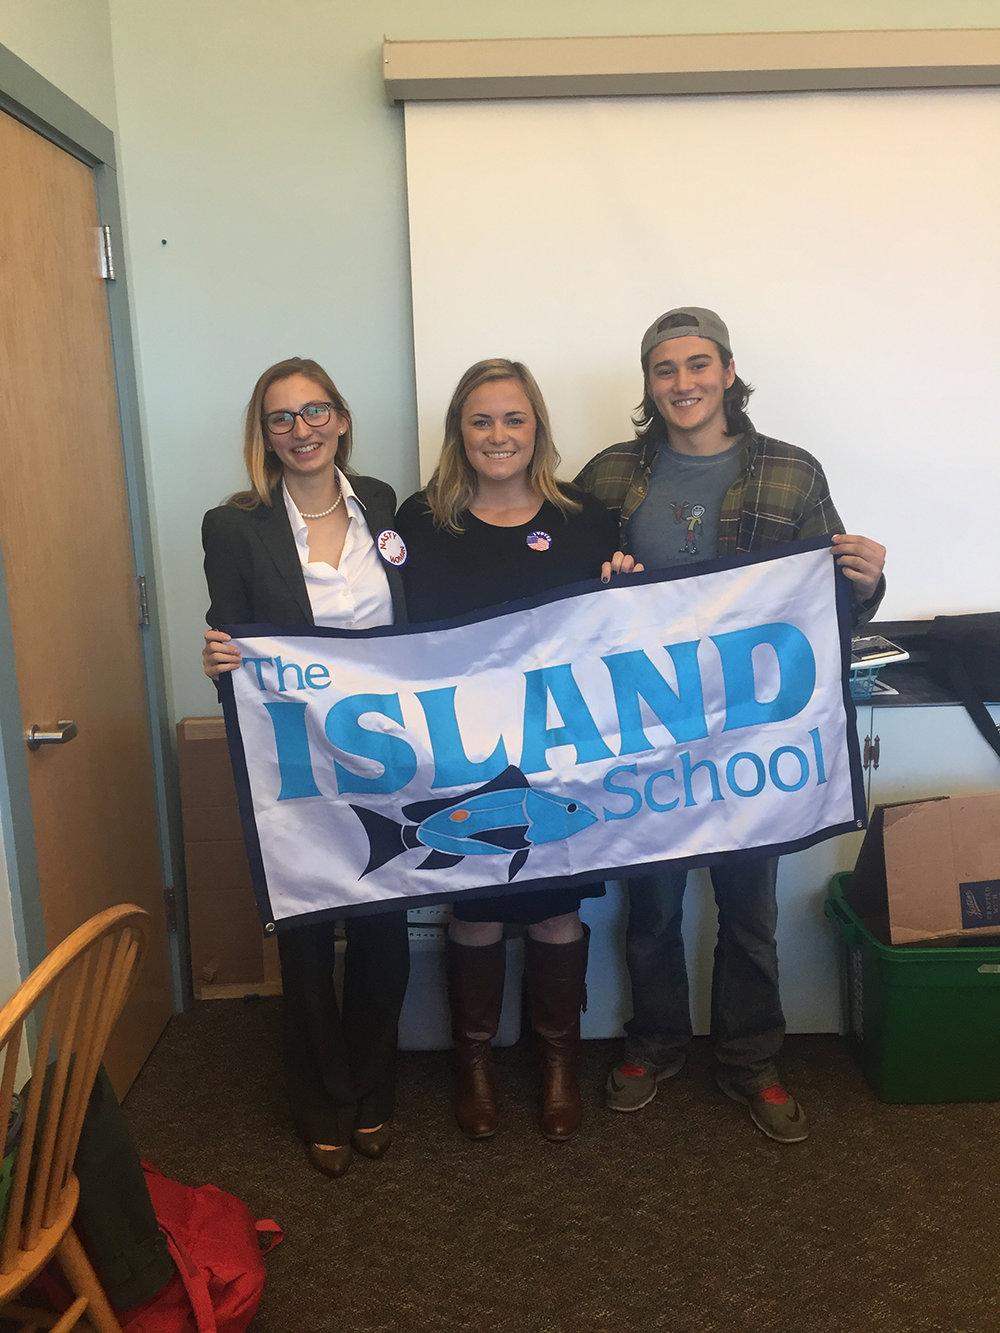 Thetford Academy: Clara Hoffman (F '15), Taylor, and Kia O'Connor (F'15)